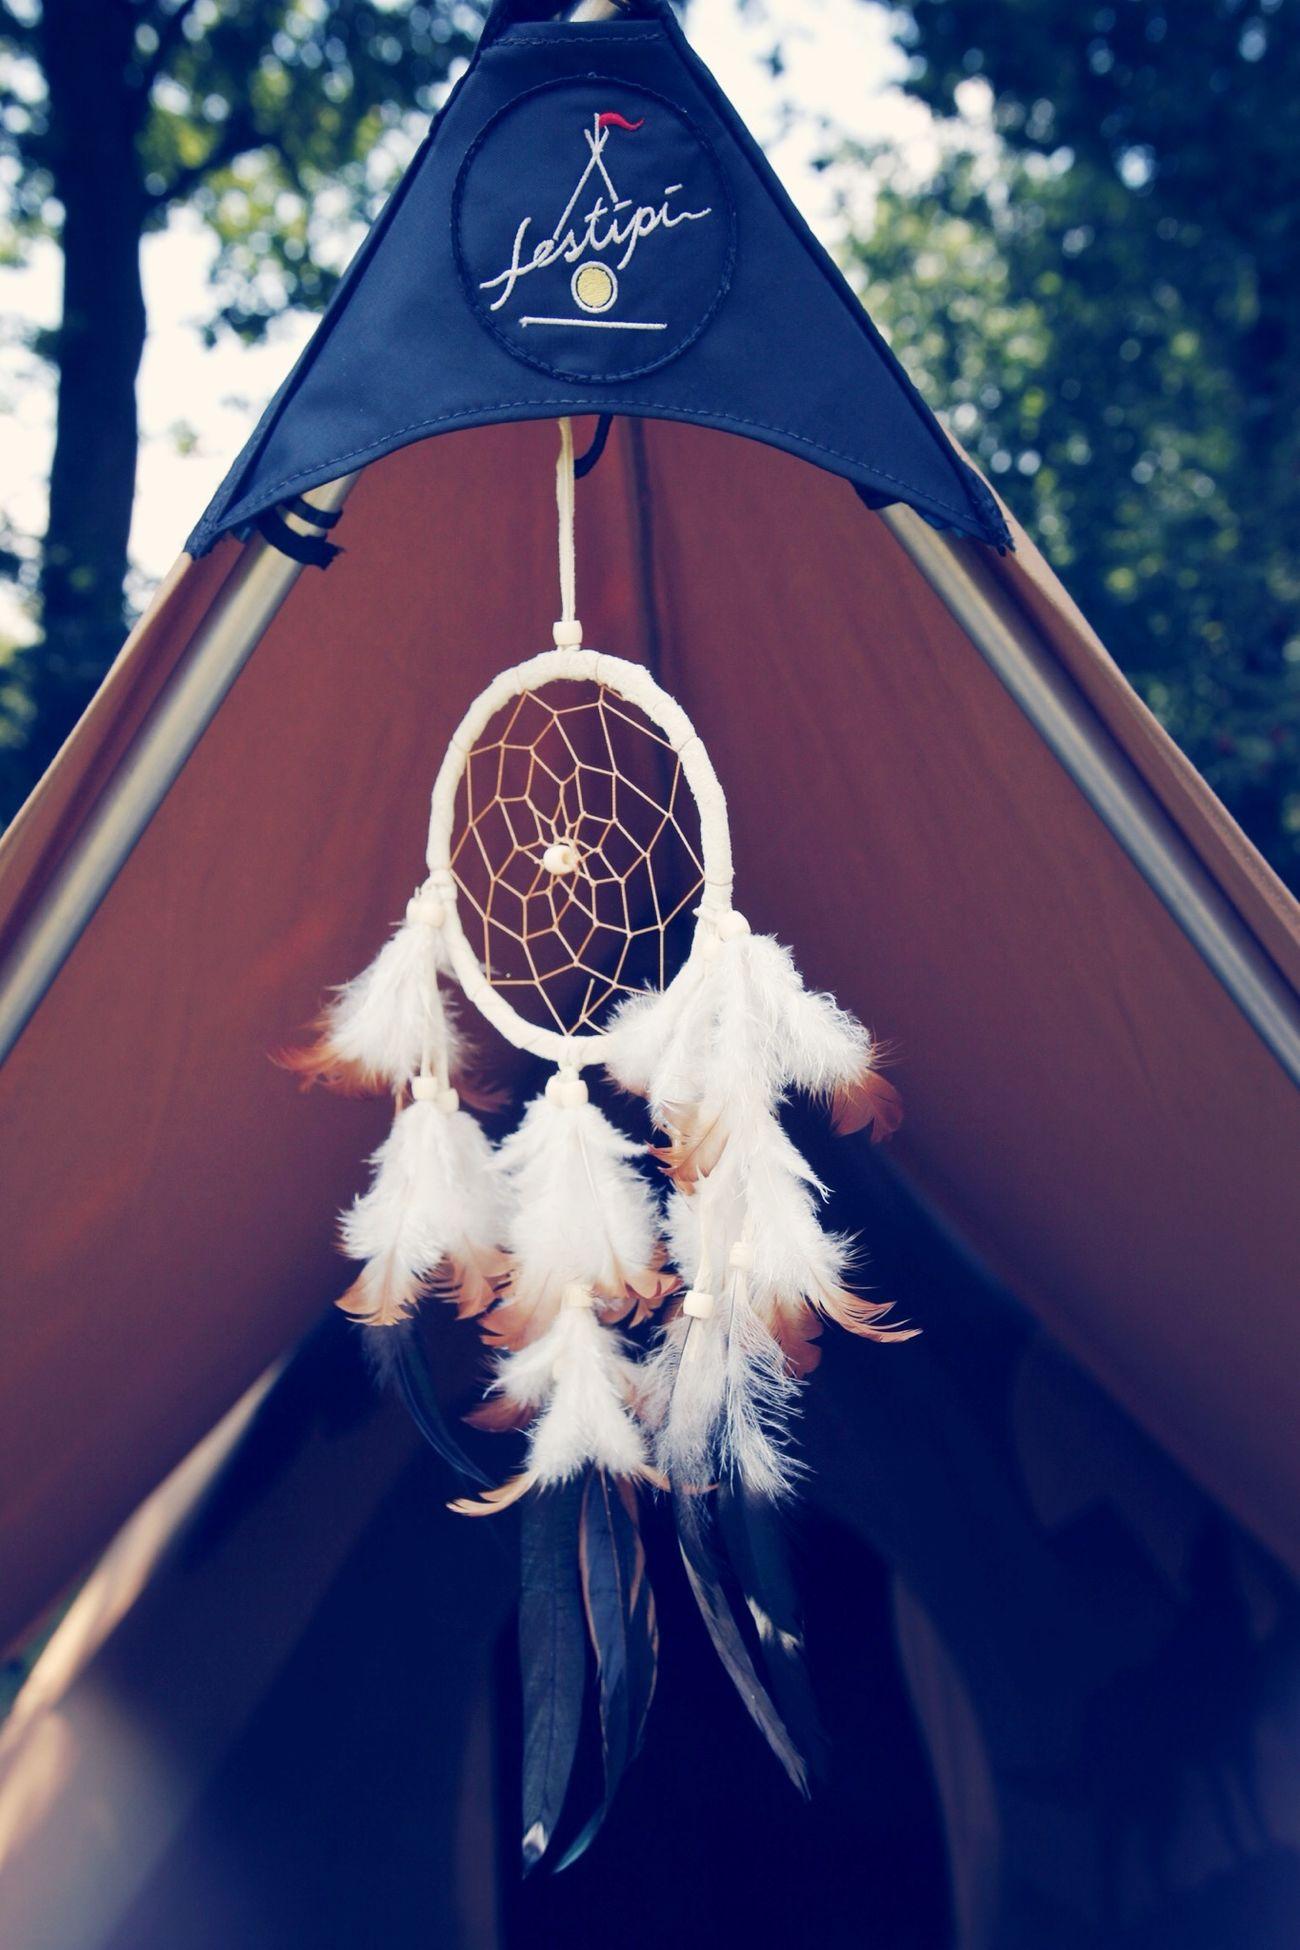 Festipi Dreamcatcher Festipi Festival camping Camping